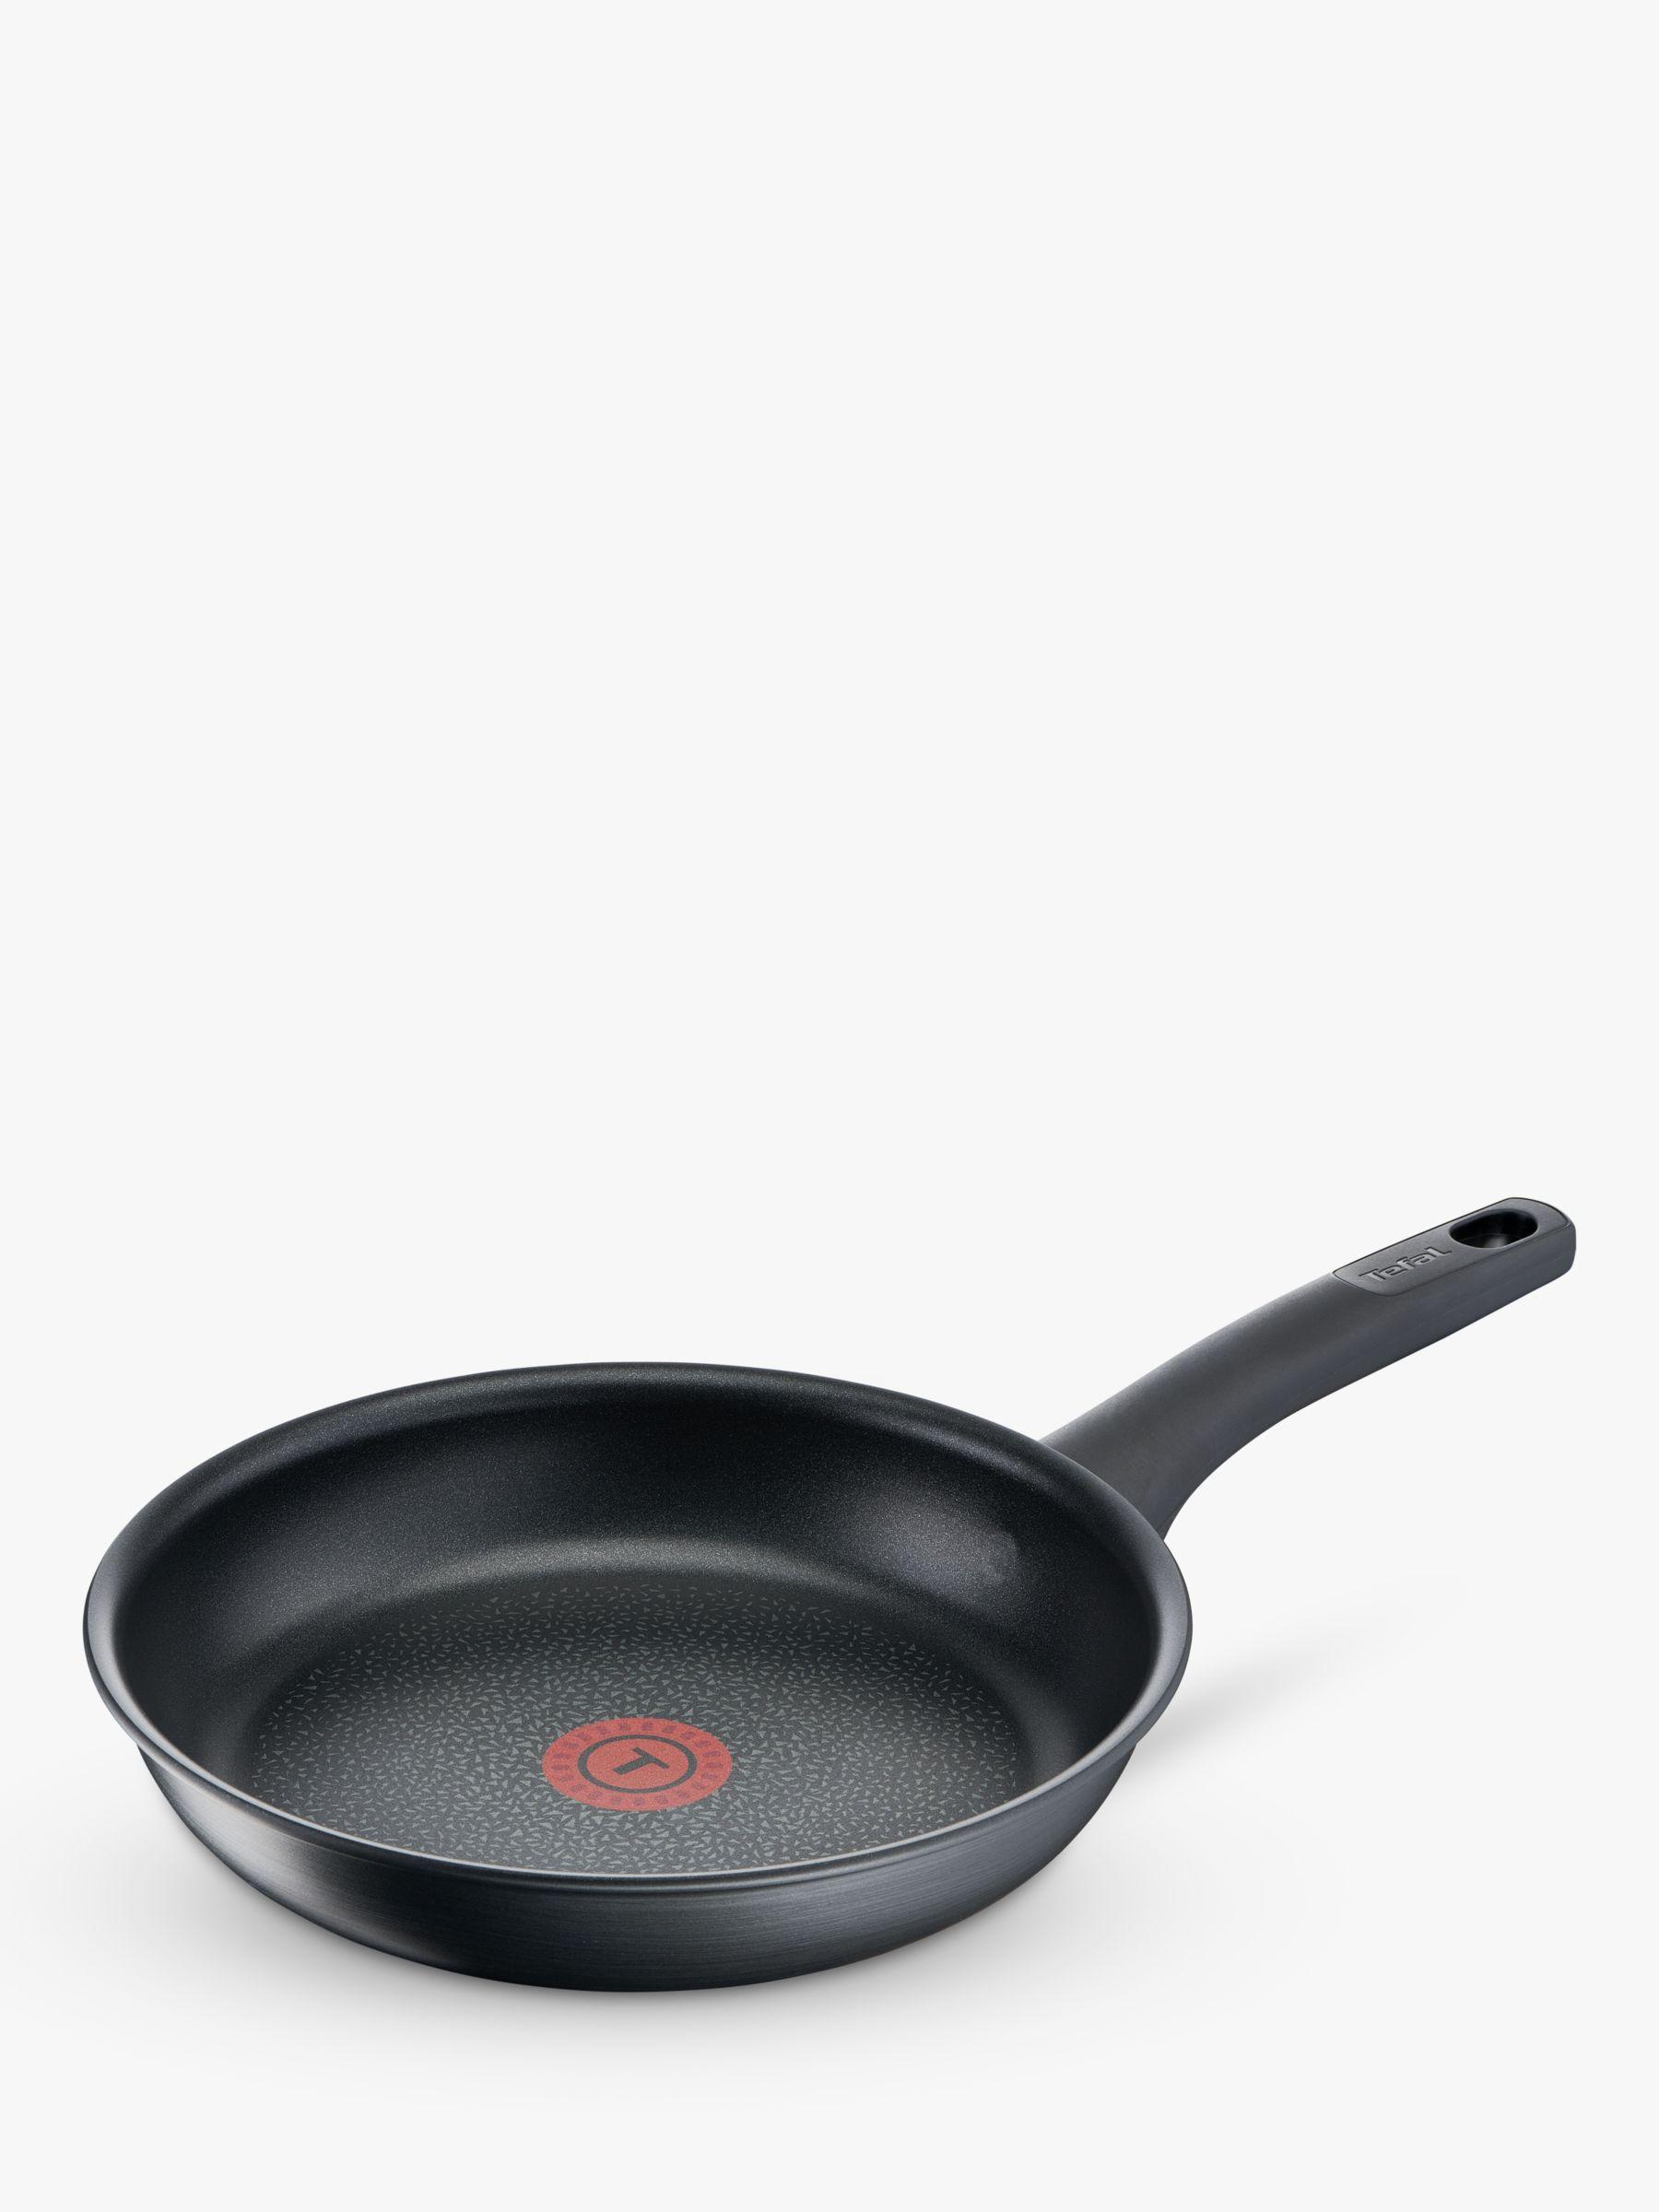 Tefal Tefal Titanium Fusion Non-Stick Frying Pan